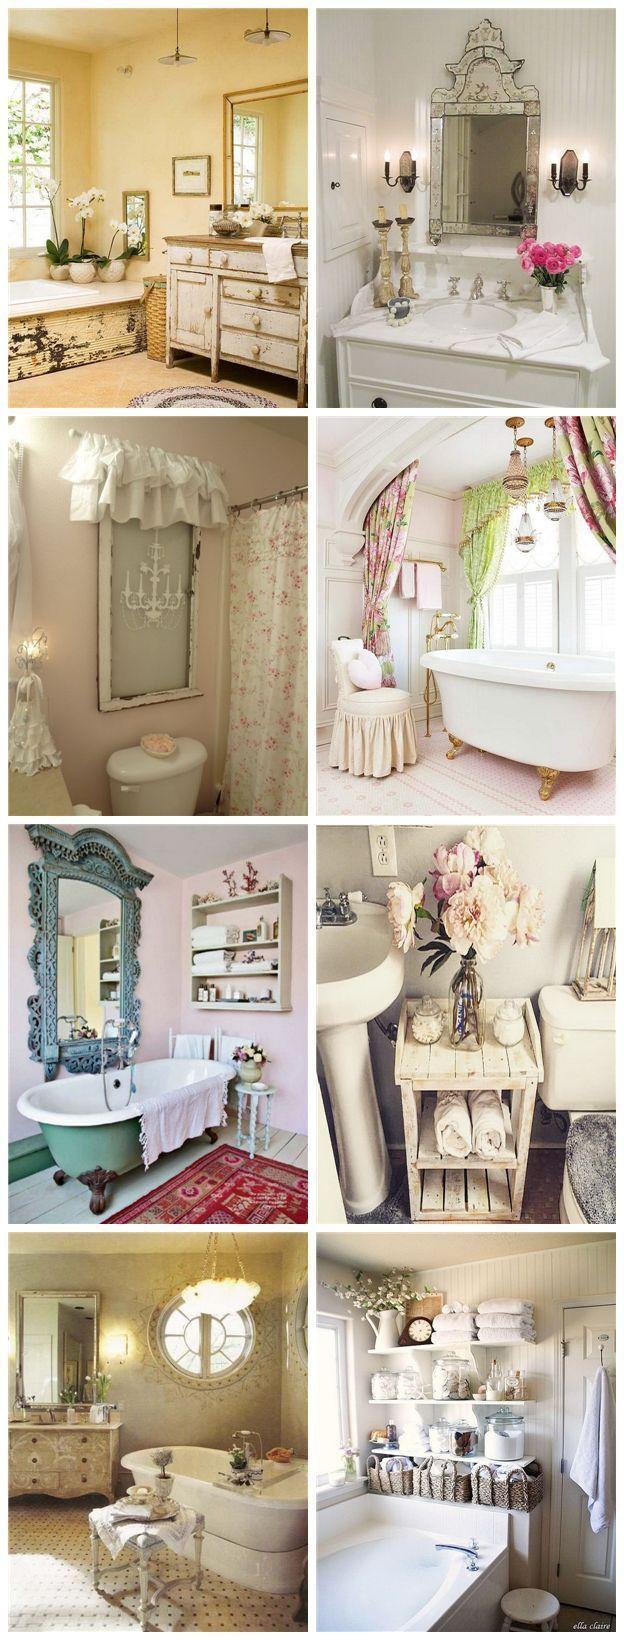 Awesome Shabby Chic Bathroom Ideas.